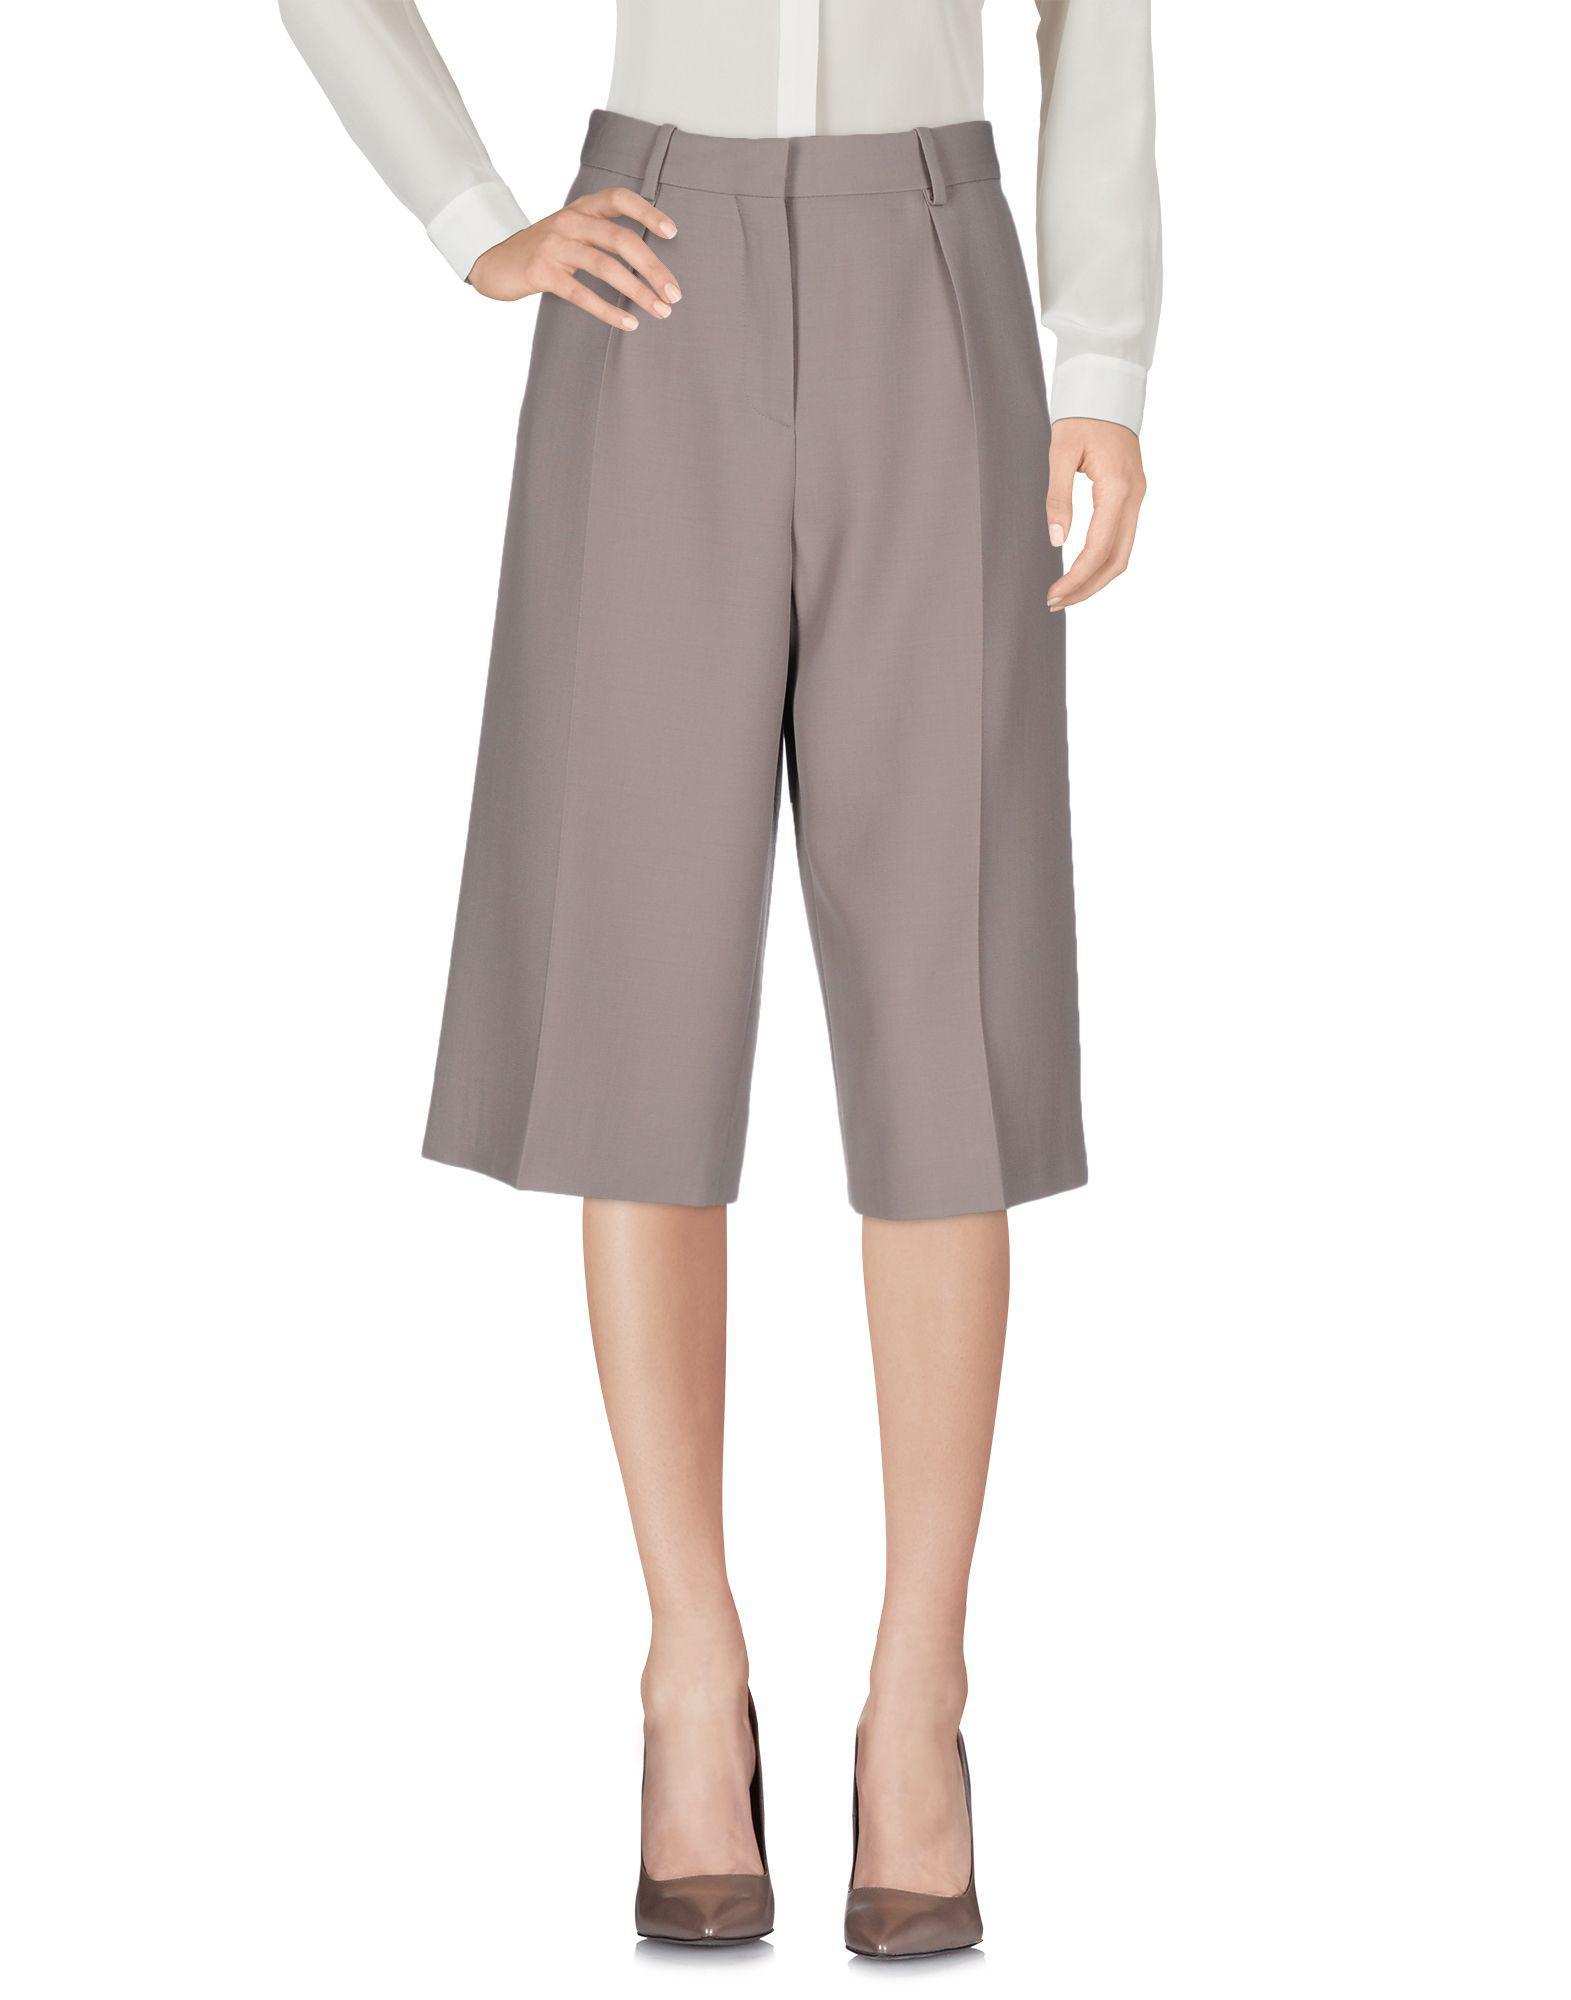 TROUSERS - 3/4-length trousers Maison Martin Margiela x7fJ9wKS